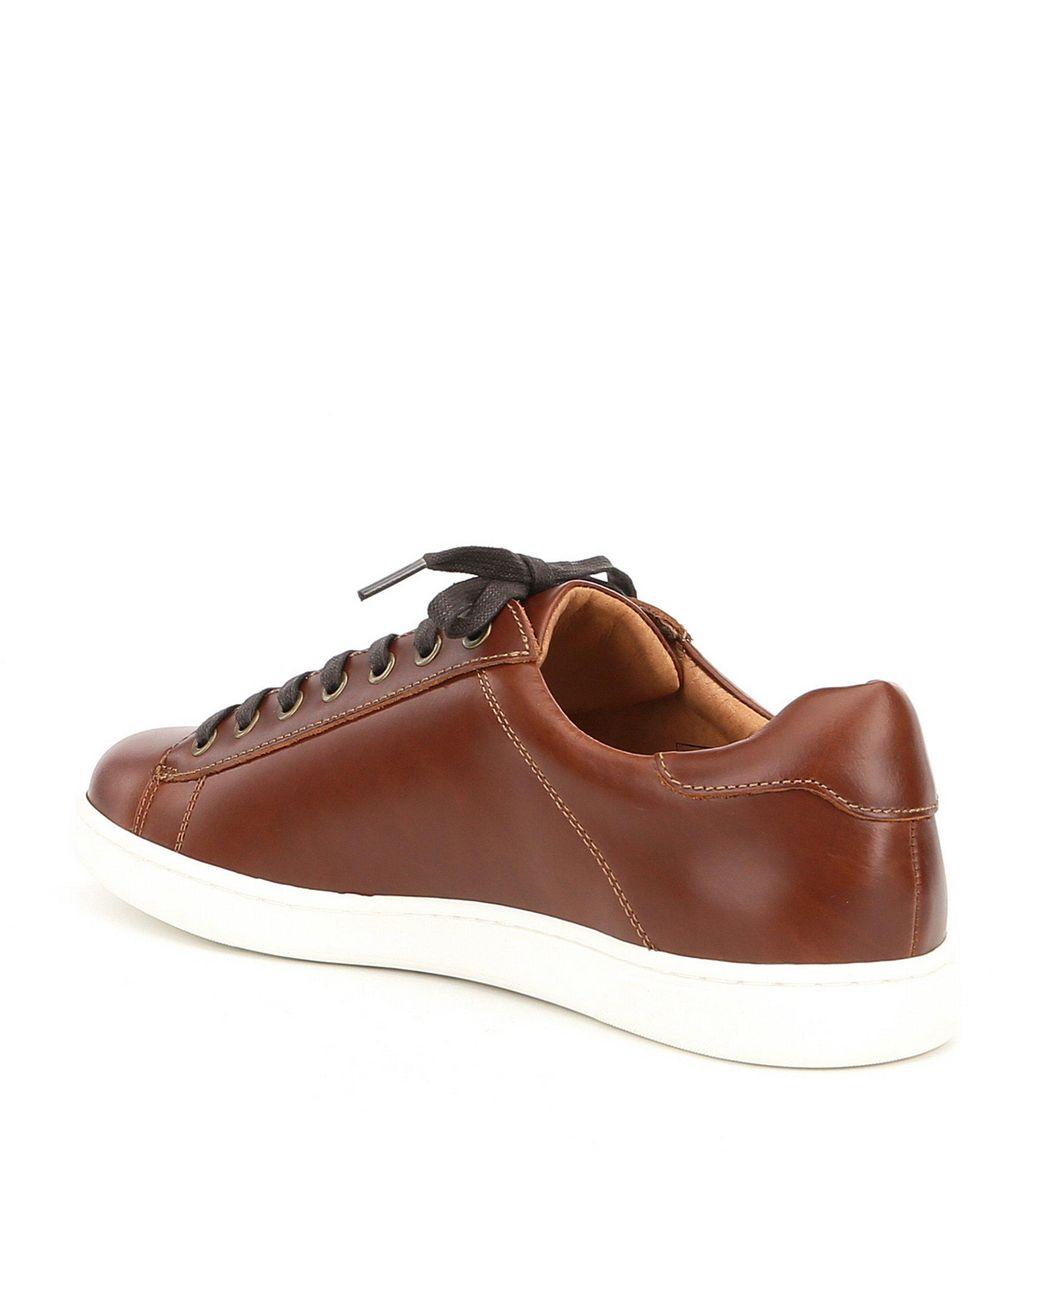 ee3c1c9e419e1 Vionic Men's Baldwin Lace Up Sneakers in Brown for Men - Lyst